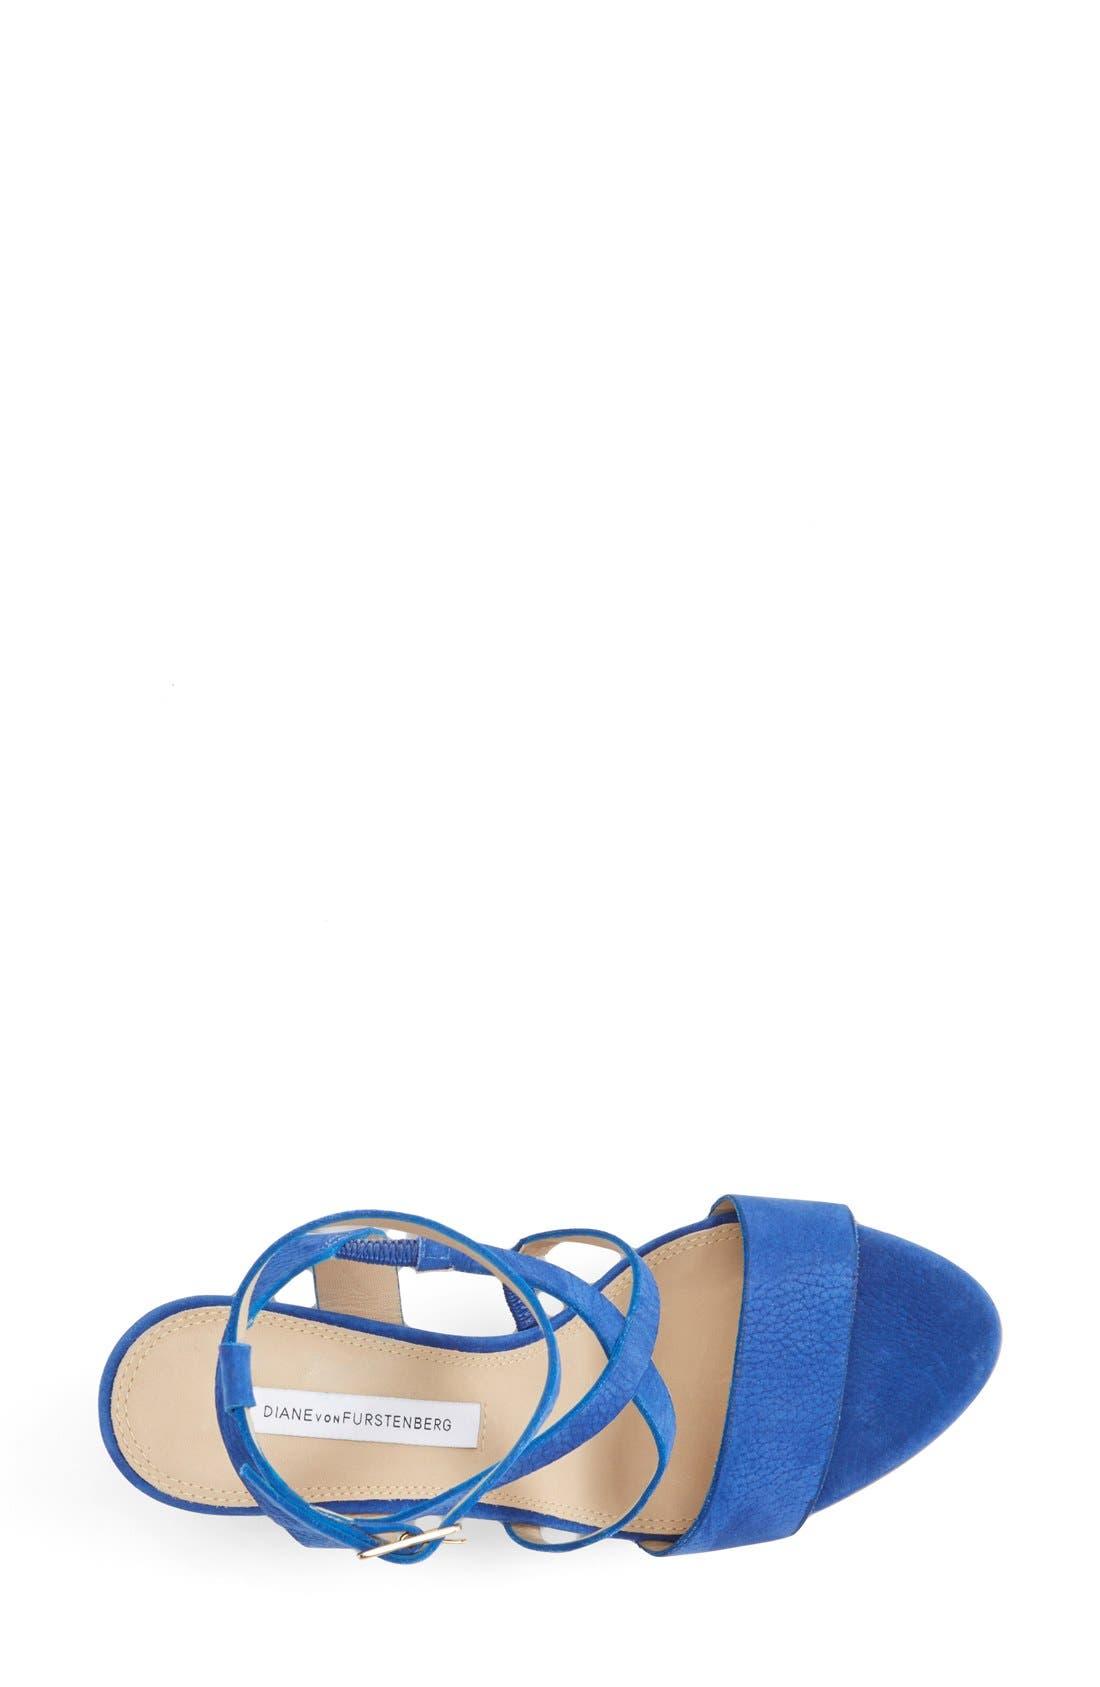 DIANE VON FURSTENBERG,                             'Lamille' Leather Platform Wedge Sandal,                             Alternate thumbnail 4, color,                             485